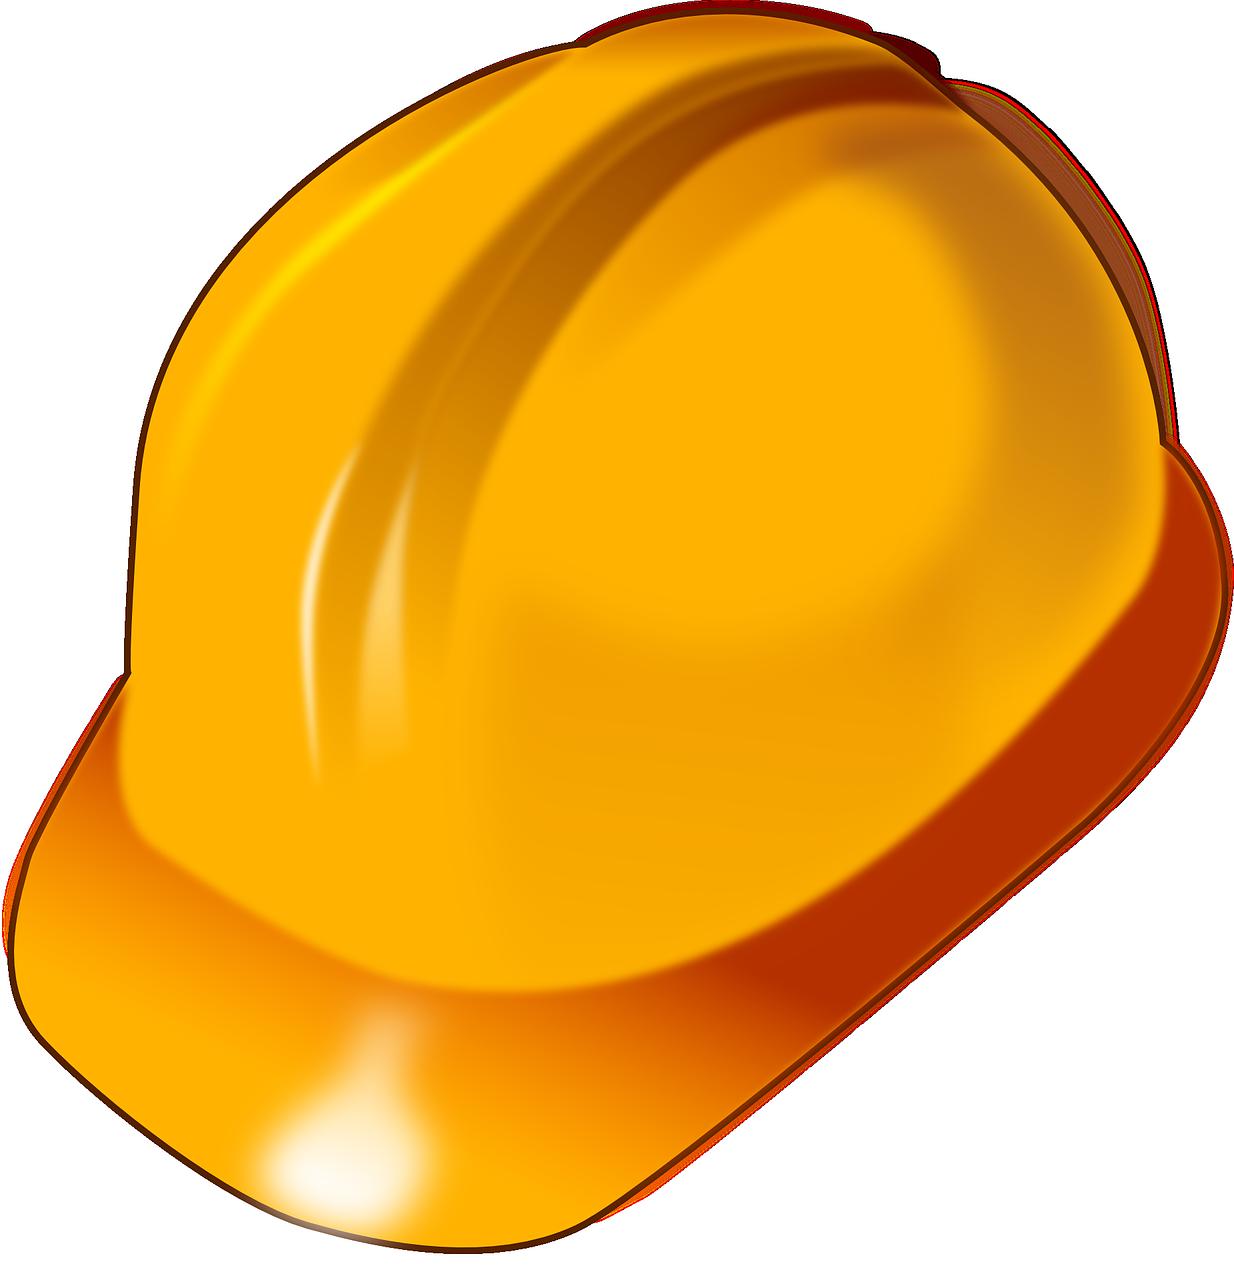 Free image on pixabay. Waffle clipart heart